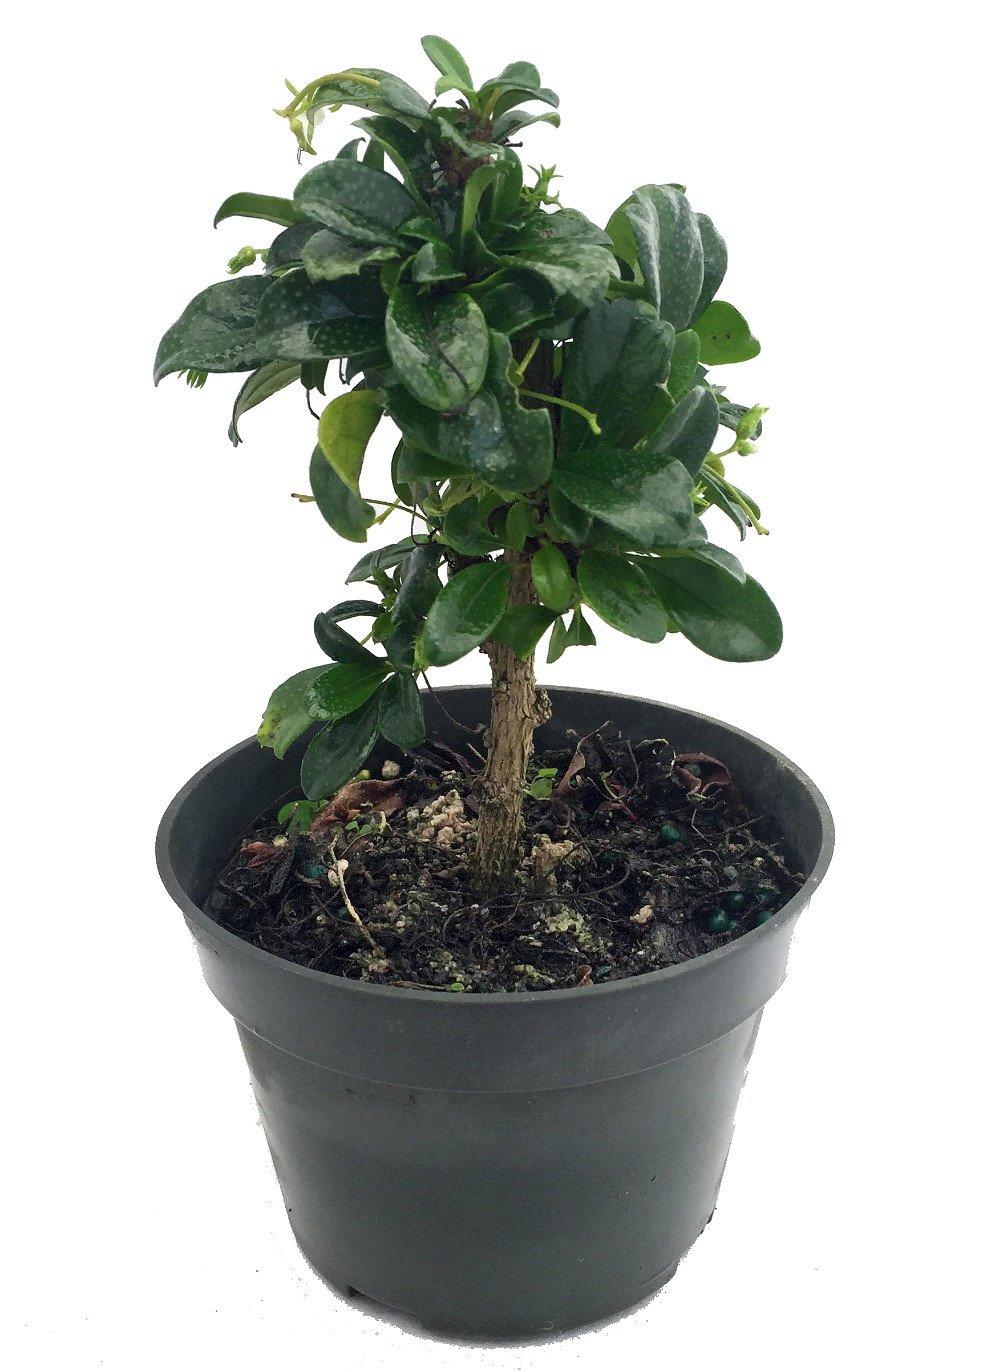 Fukien Tea Bonsai Tree - Carmona - 6'' Pot - Indoor Houseplant